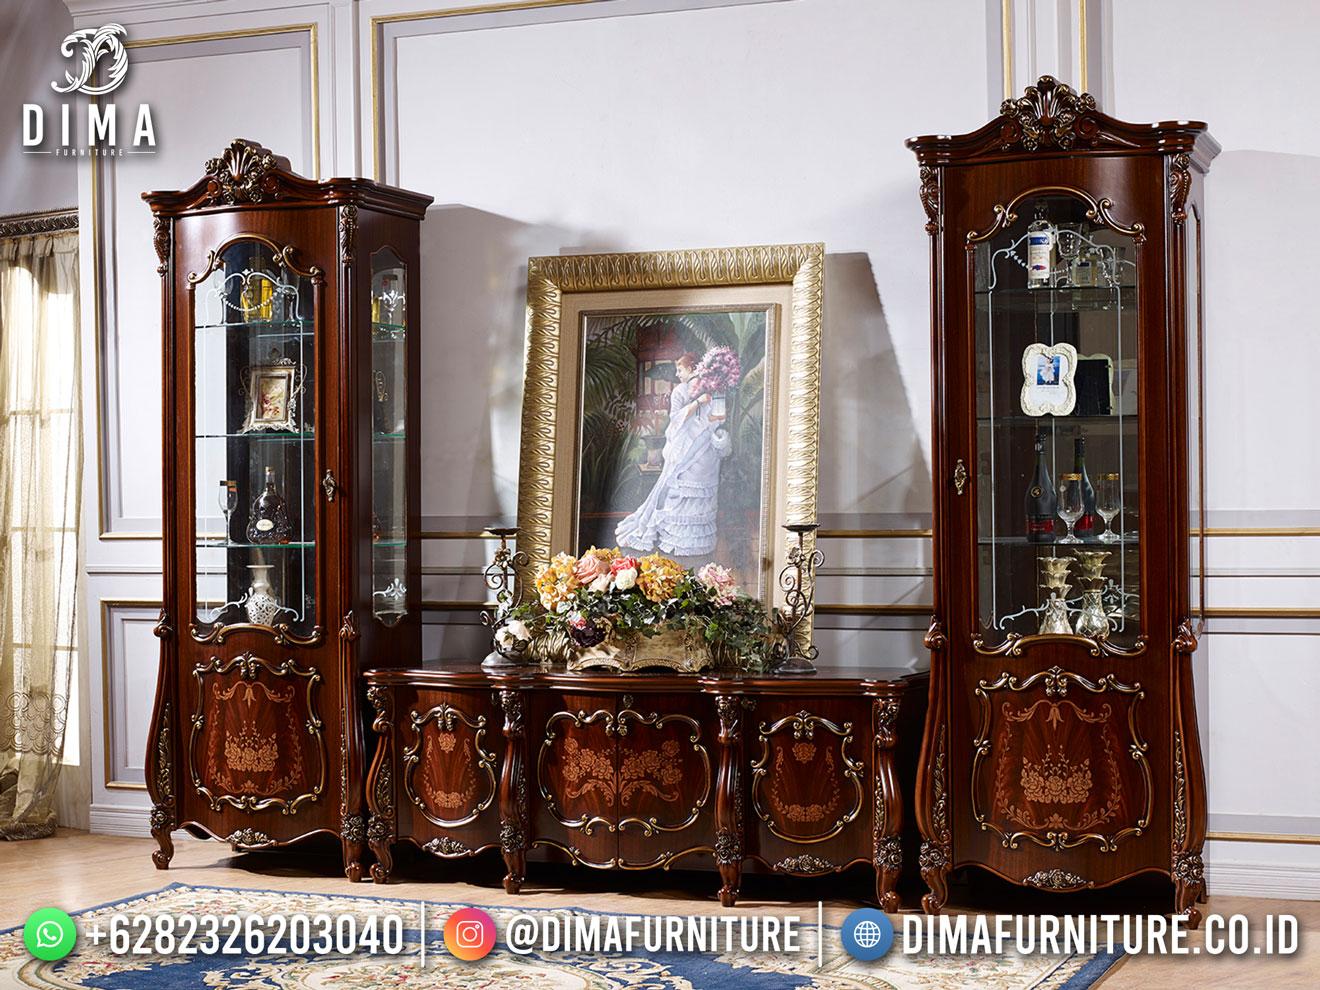 Luxury Elegant Bufet TV Jati Terbaru Ukiran Mewah Jepara TTJ-1859